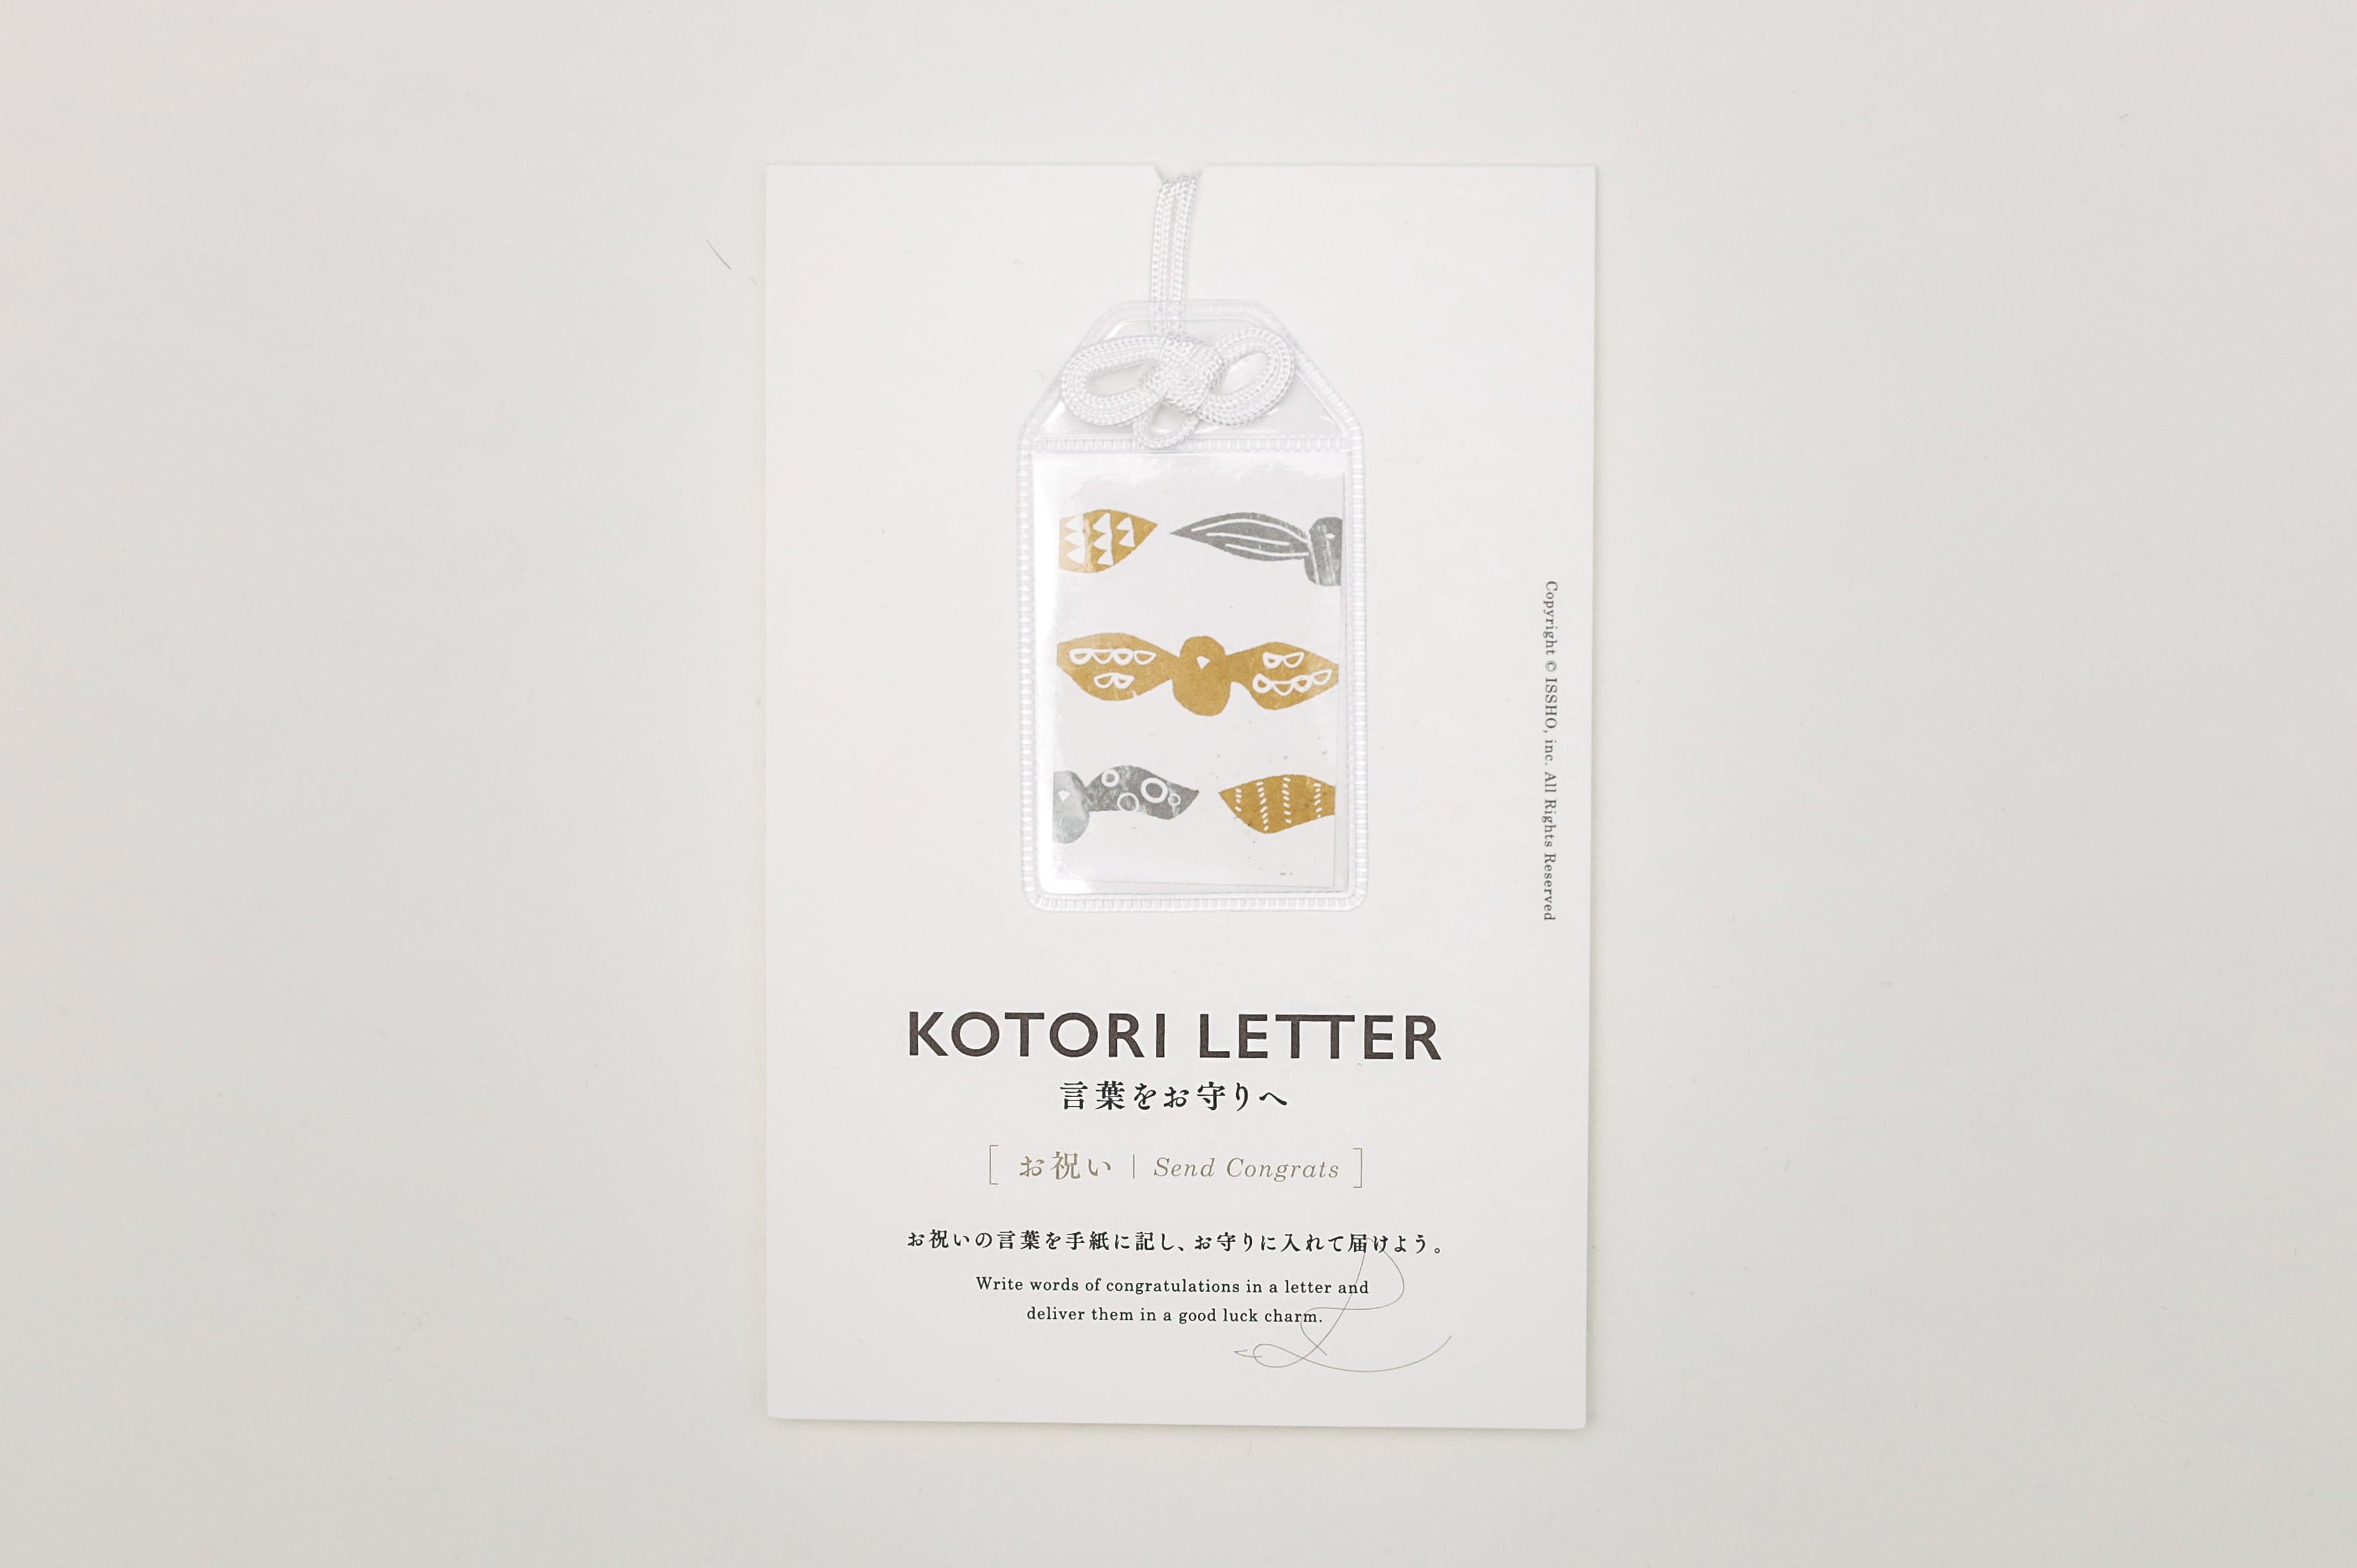 KOTORI LETTER | お祝い | Send Congrats | 梟 | Owl